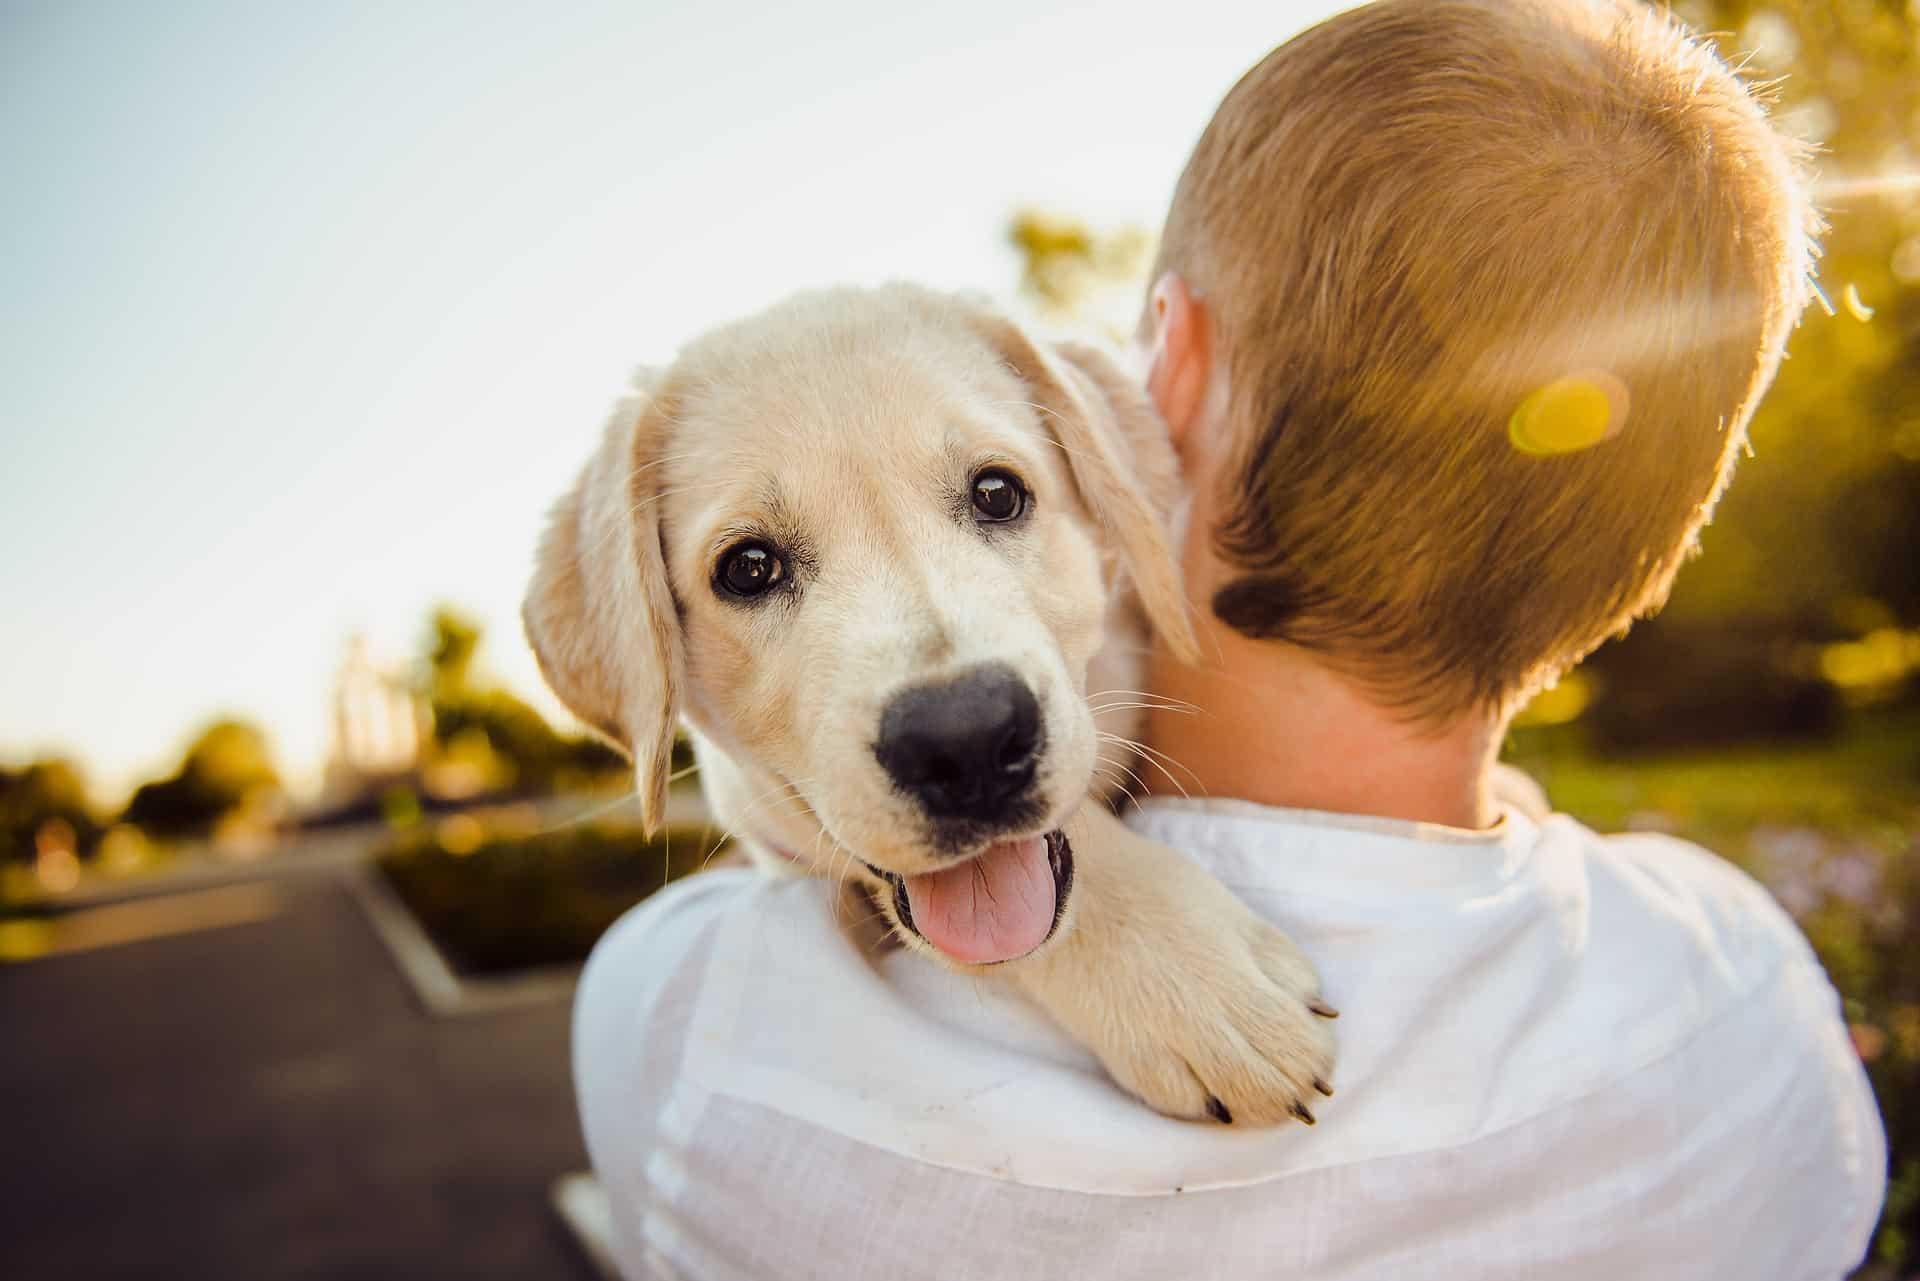 Choosing pet insurance for a dog